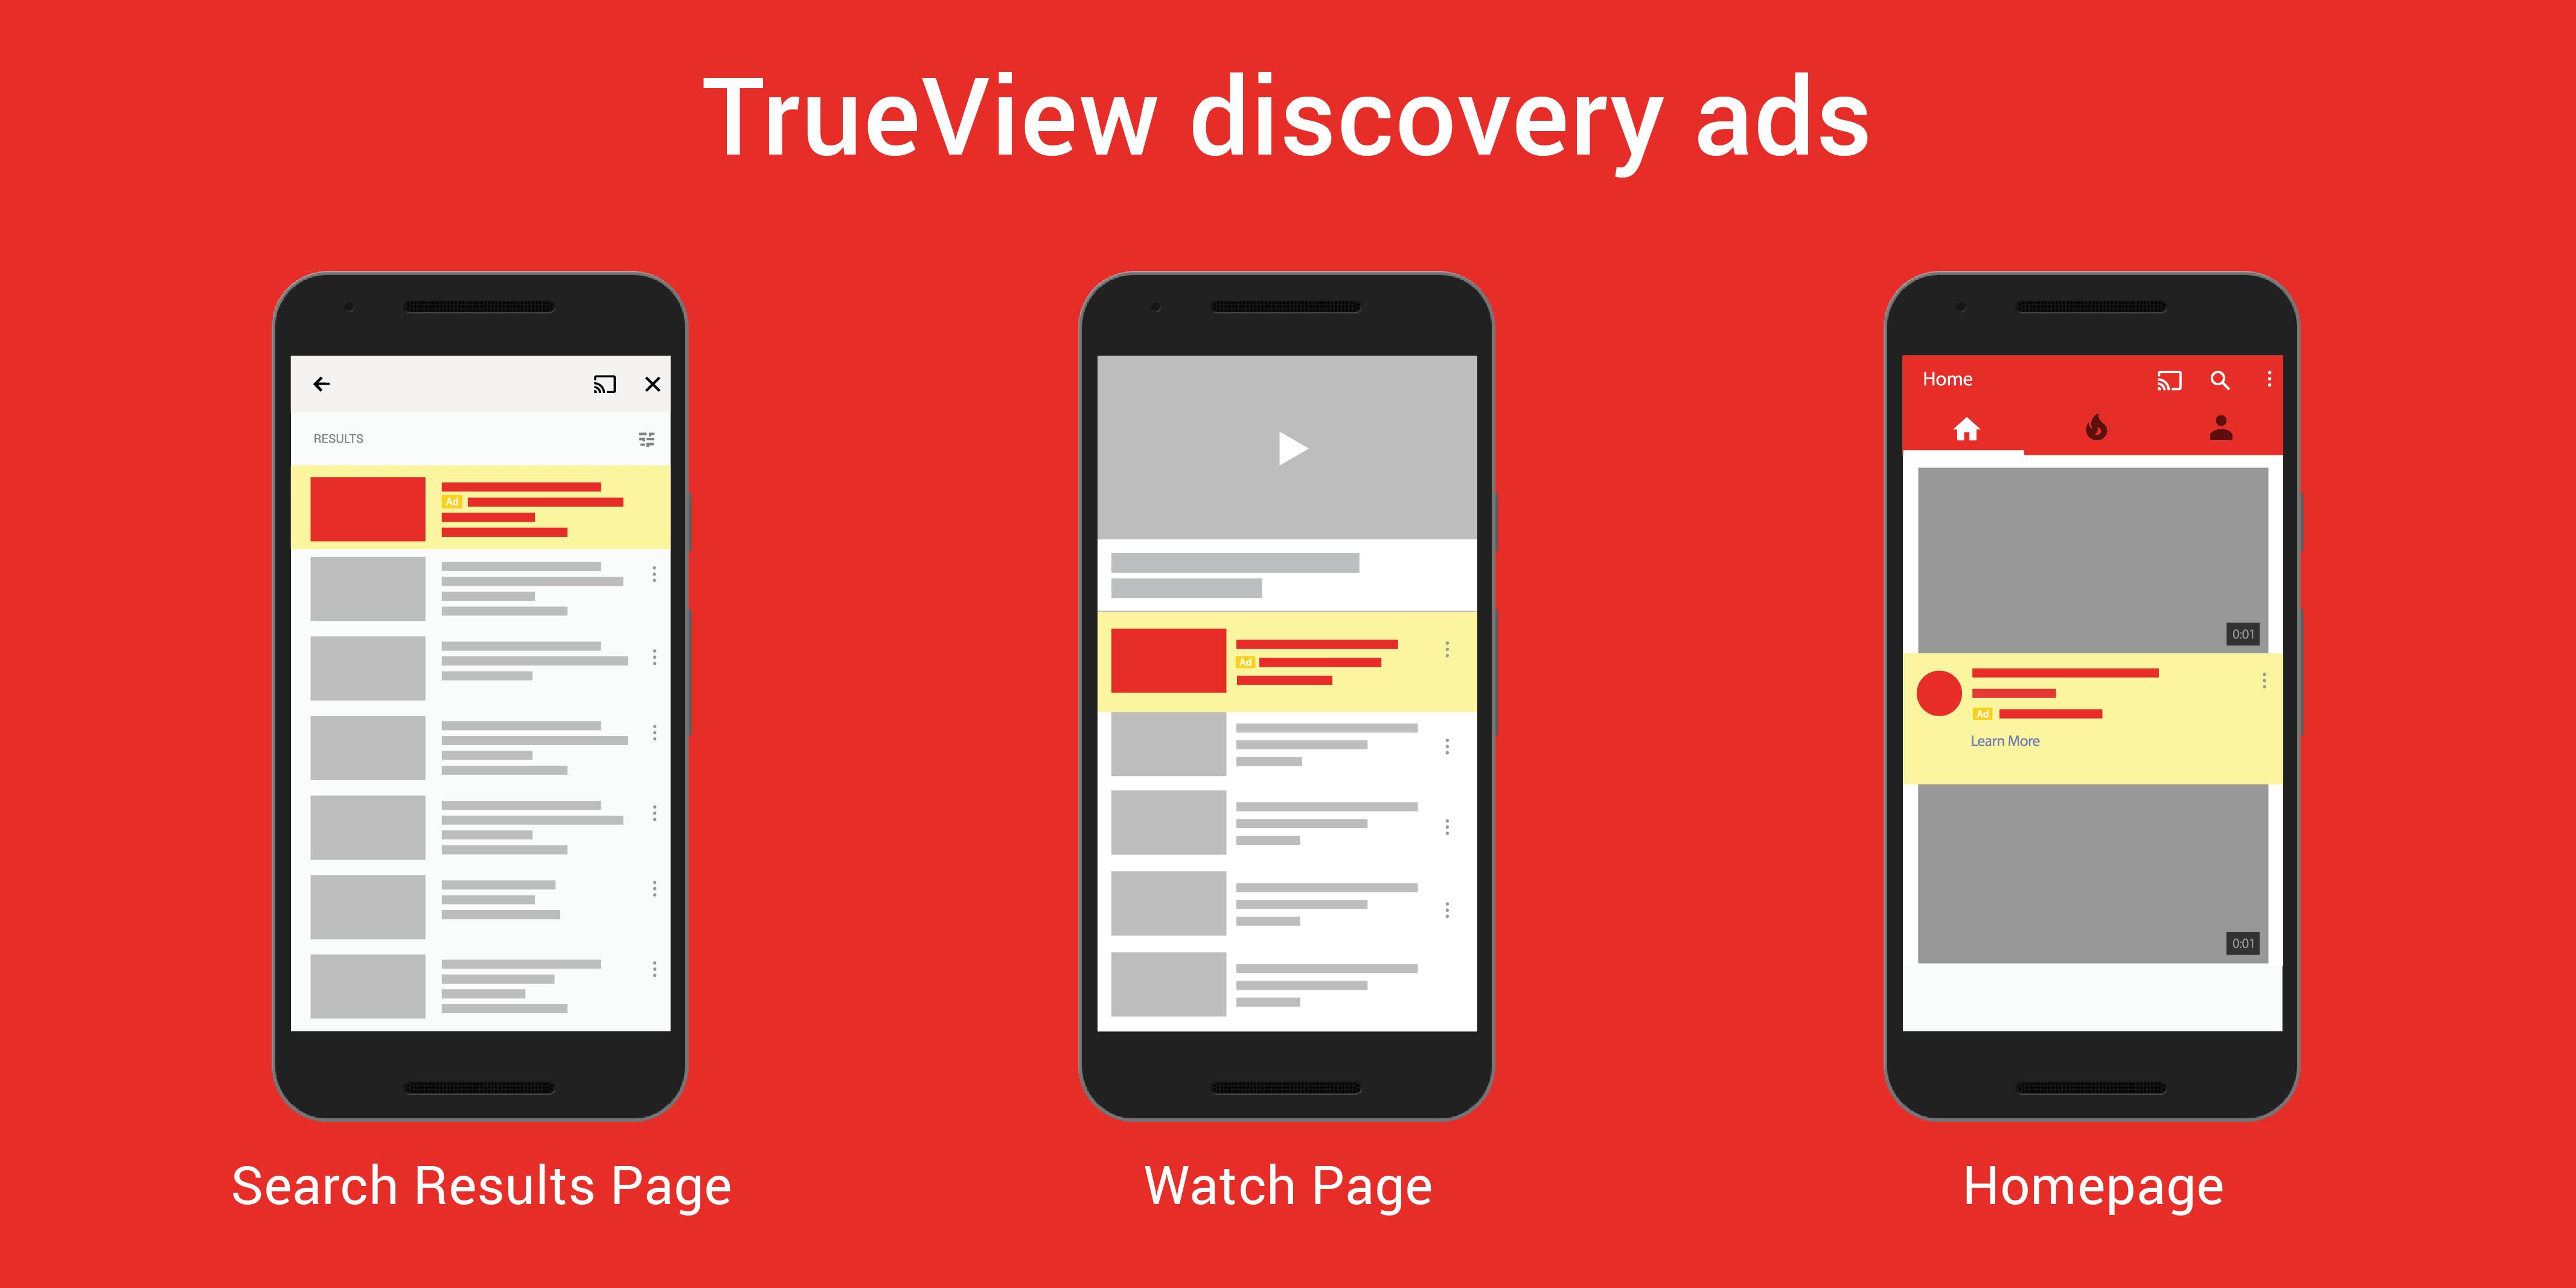 TrueView Discovery